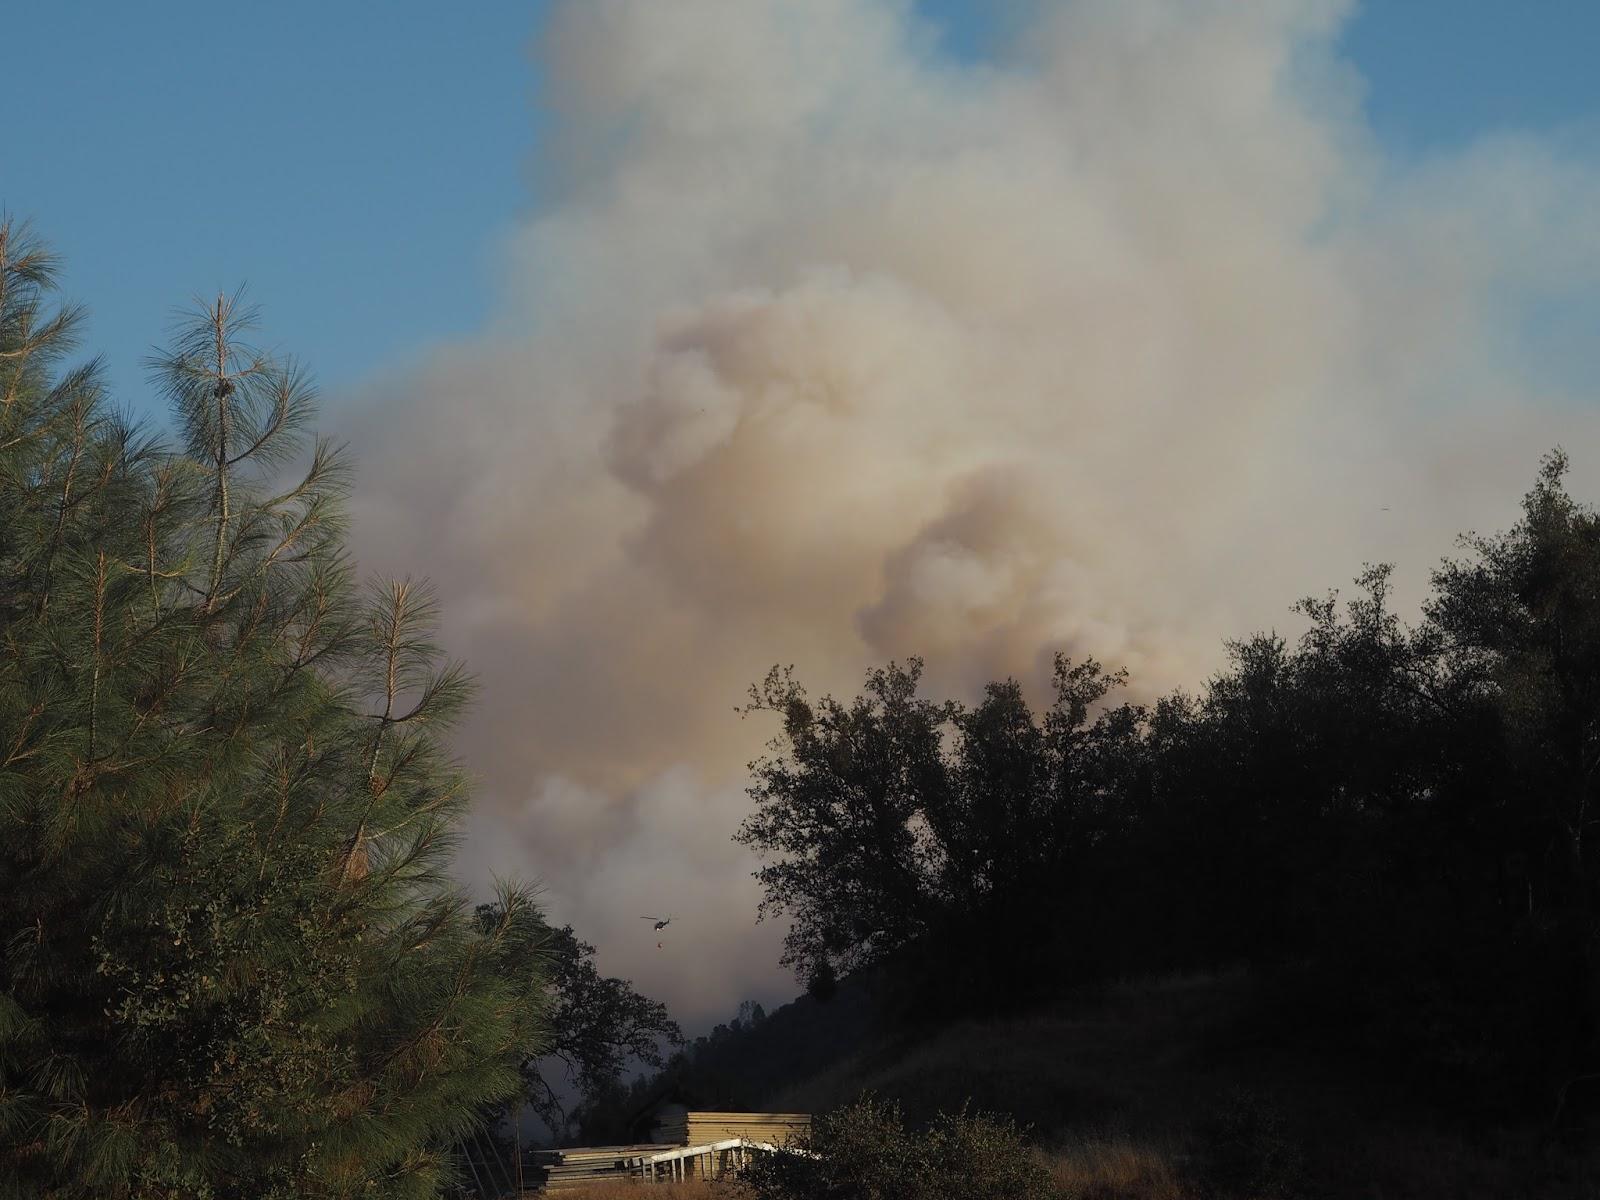 Fire in Yosemite National Park, California